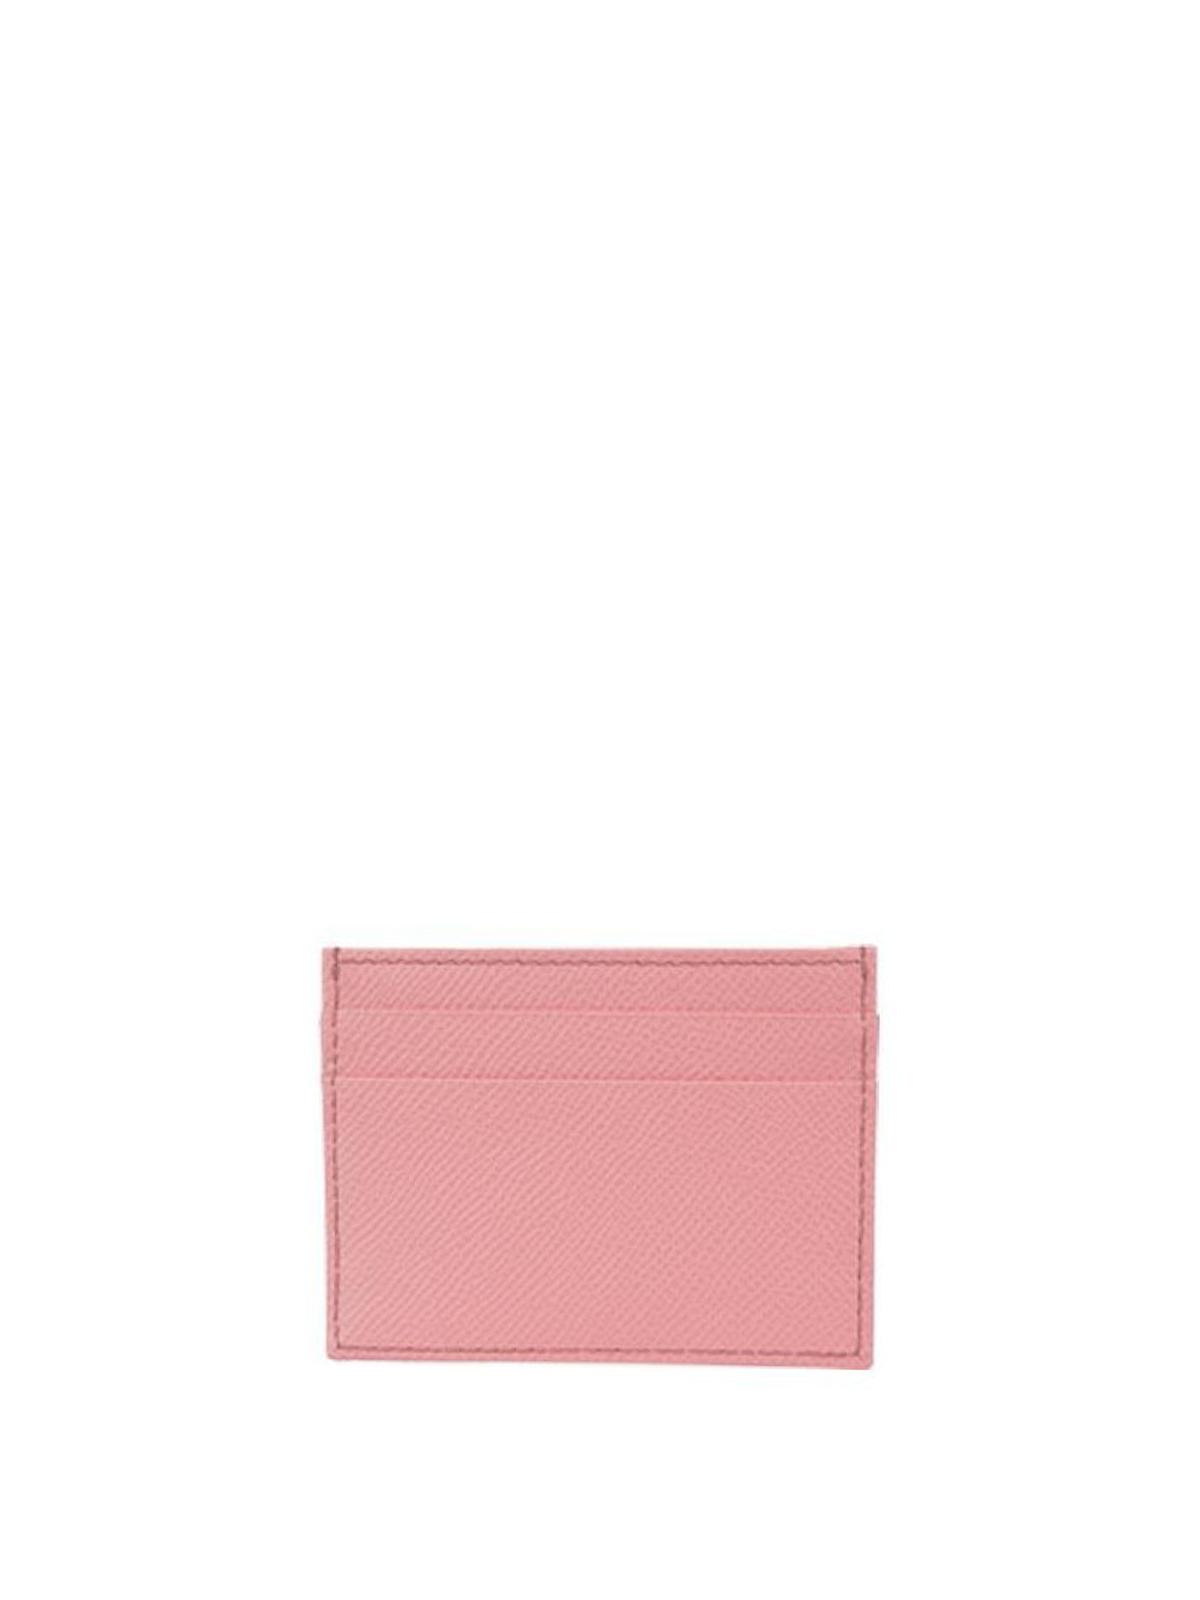 Dolce & Gabbana Rhinestone logo card holder exyLb9XQun